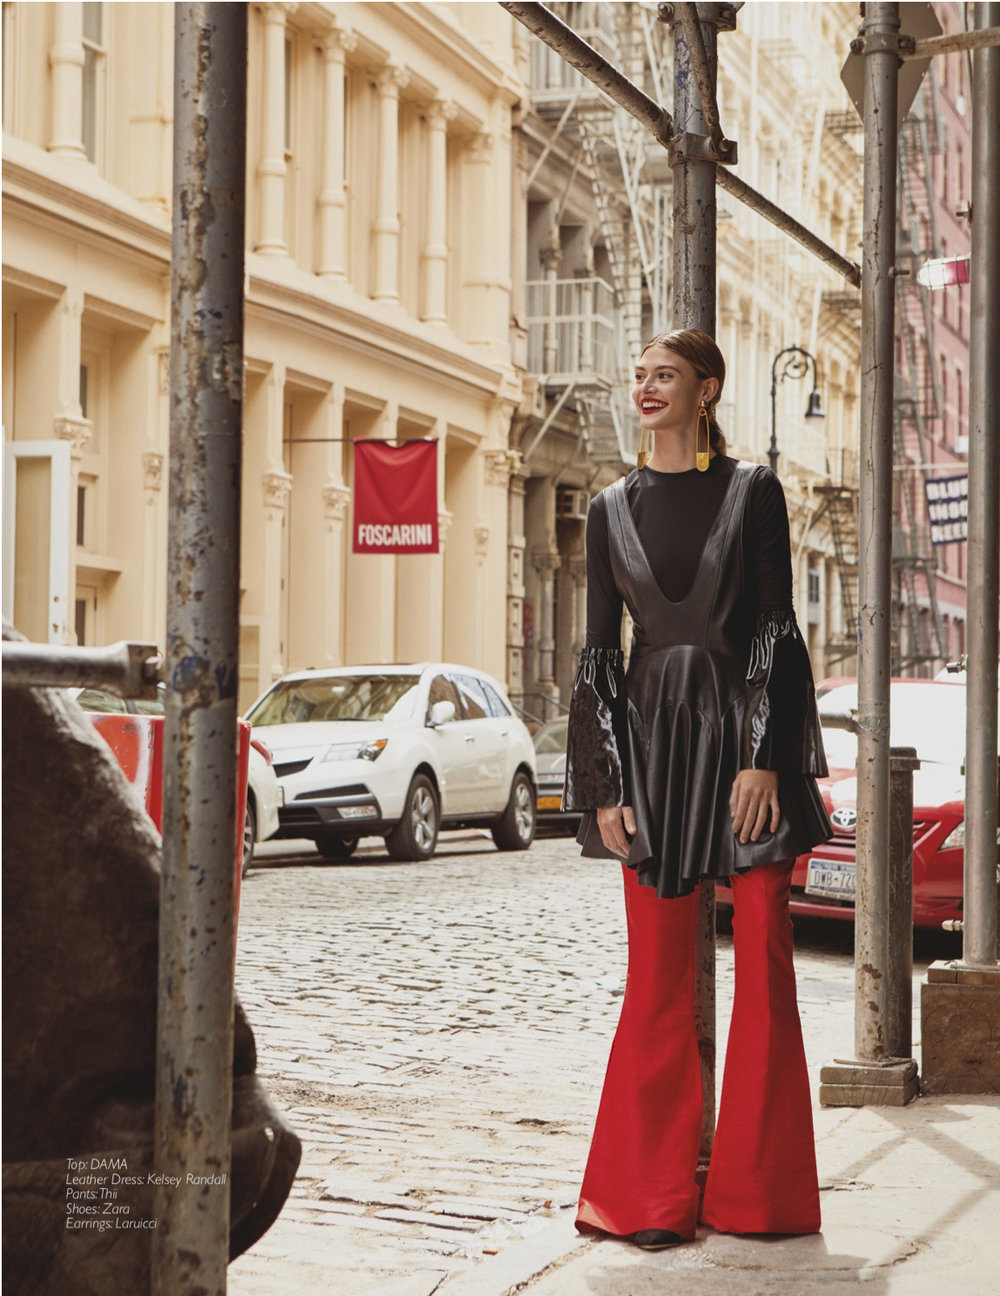 Copy of Copy of kelsey randall black leather jumper dress cesar balcazar raine magazine fashion editorial